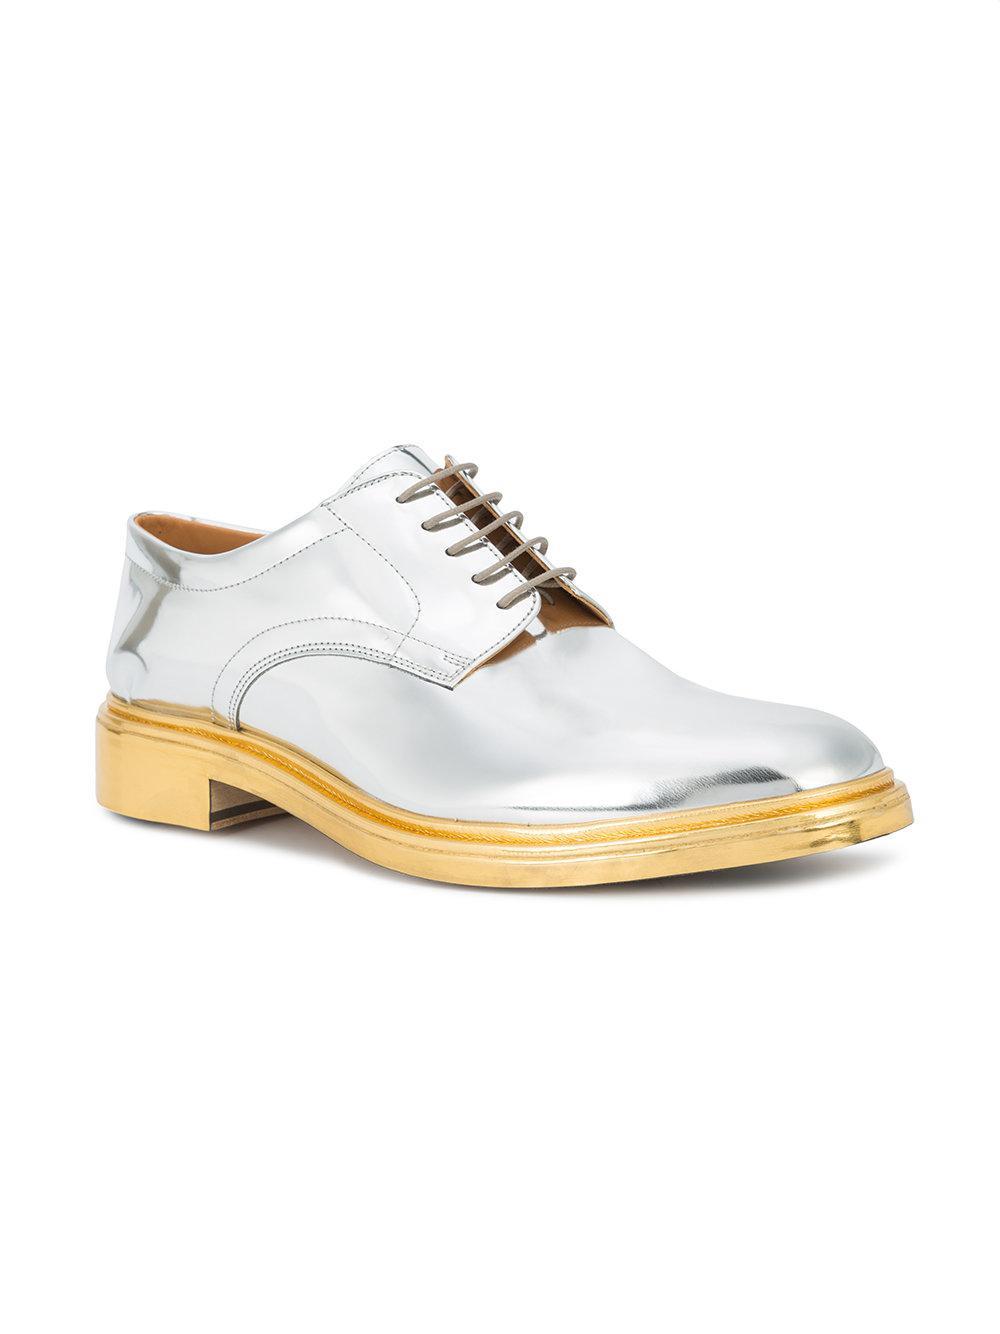 mirror derby shoes - Metallic Maison Martin Margiela bmJjJ6o